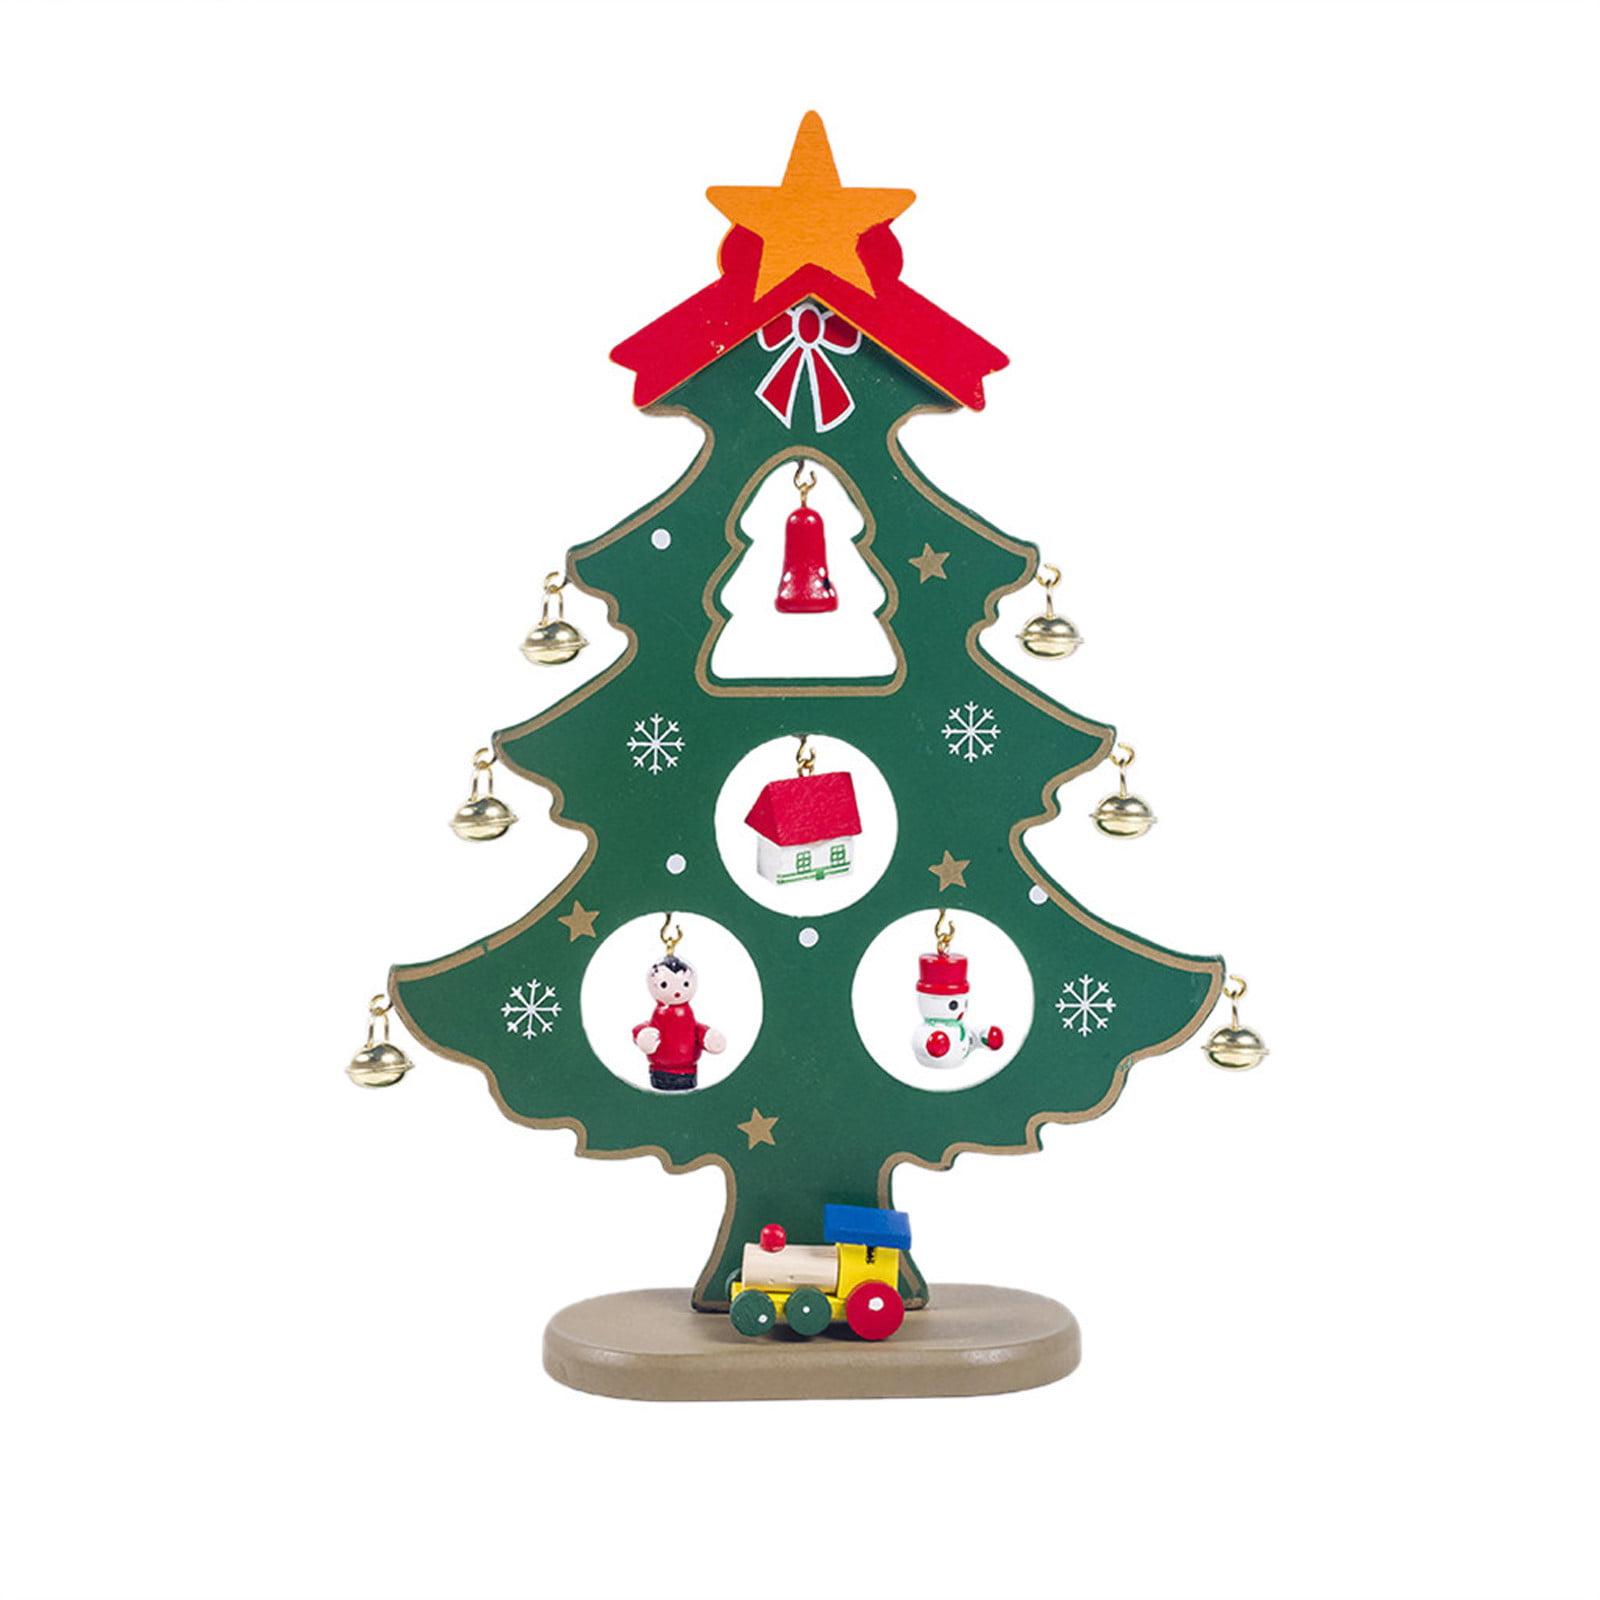 Onuneed Mini Christmas Tree Santa Claus Snowman Wooden Swing Decoration Party Decor Walmart Com Walmart Com